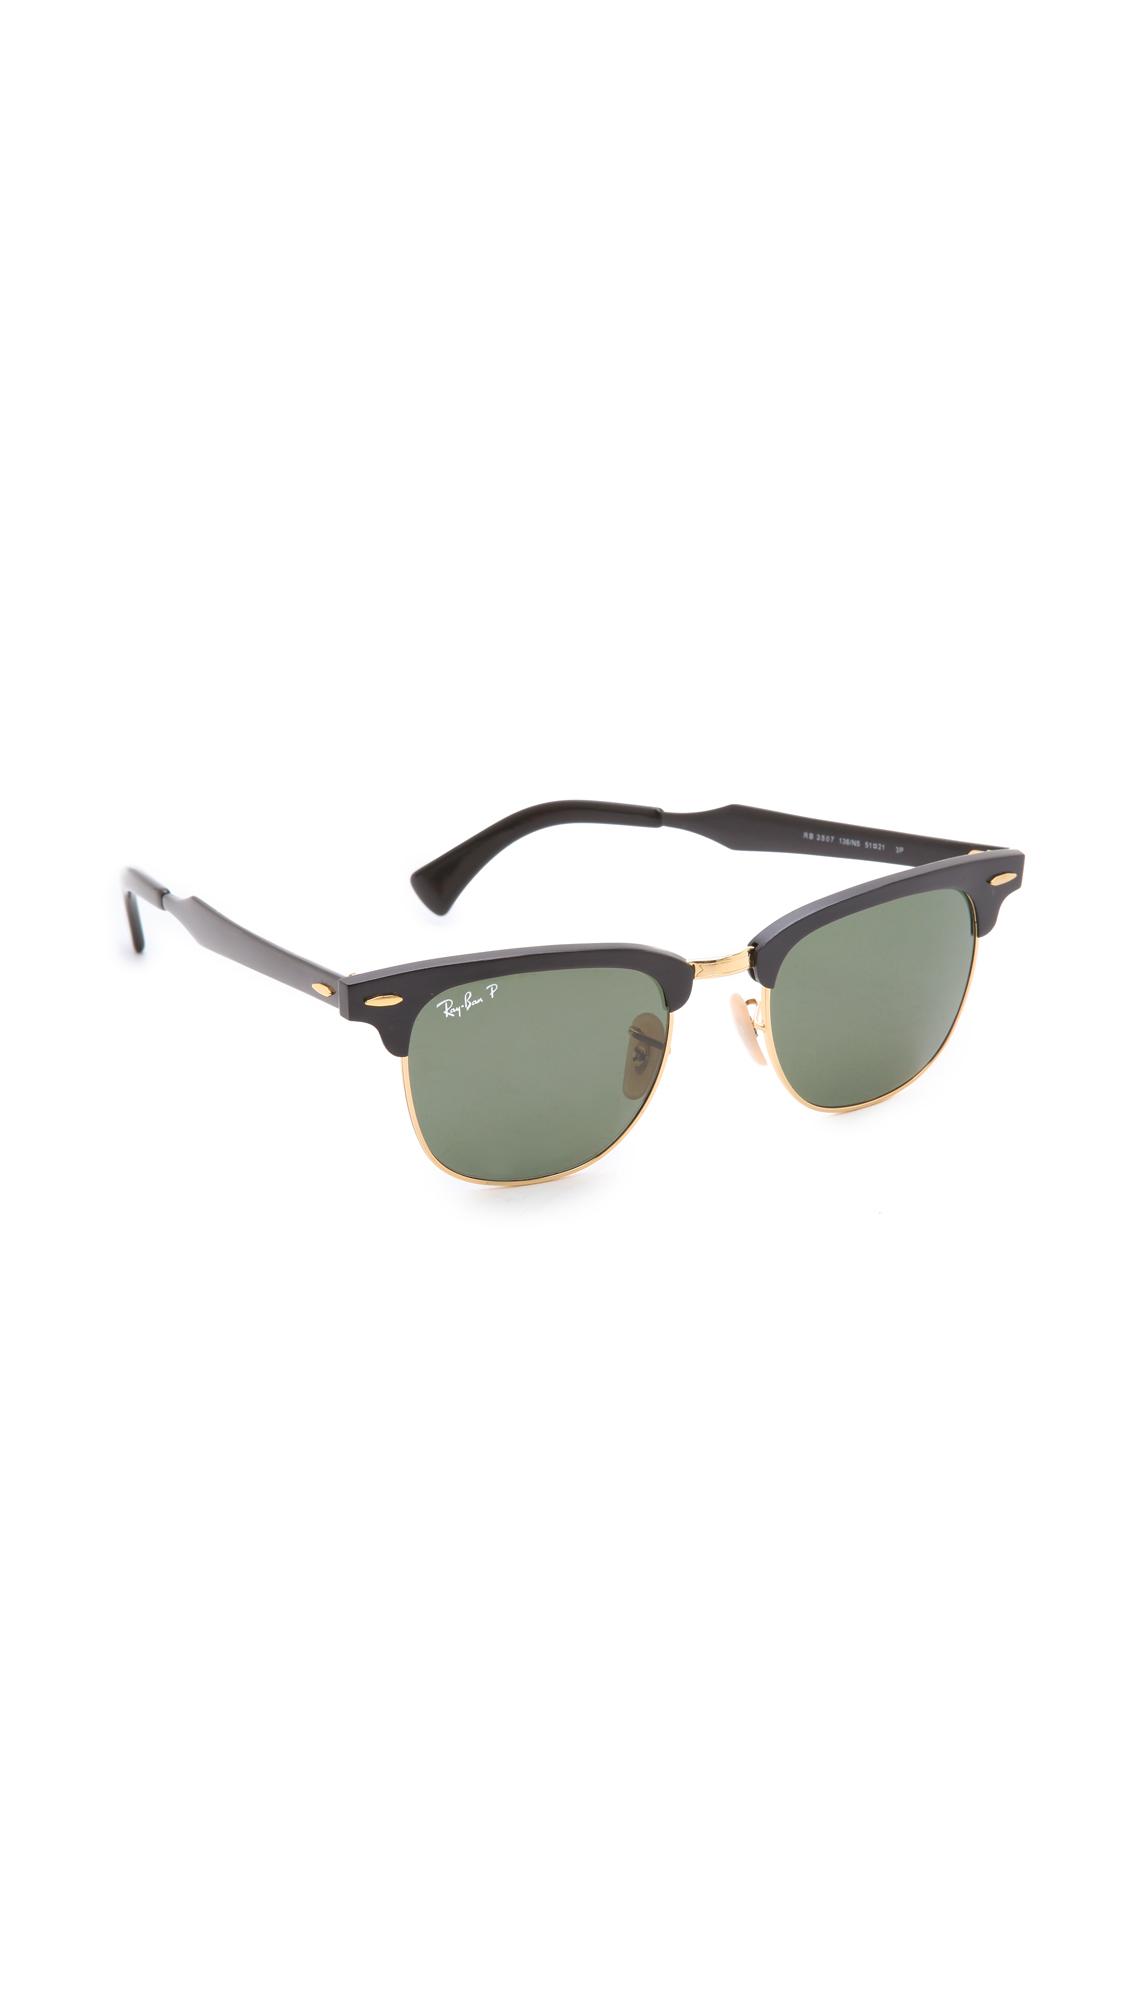 42afb07c62 Oversized Clubmaster Style Sunglasses « Heritage Malta